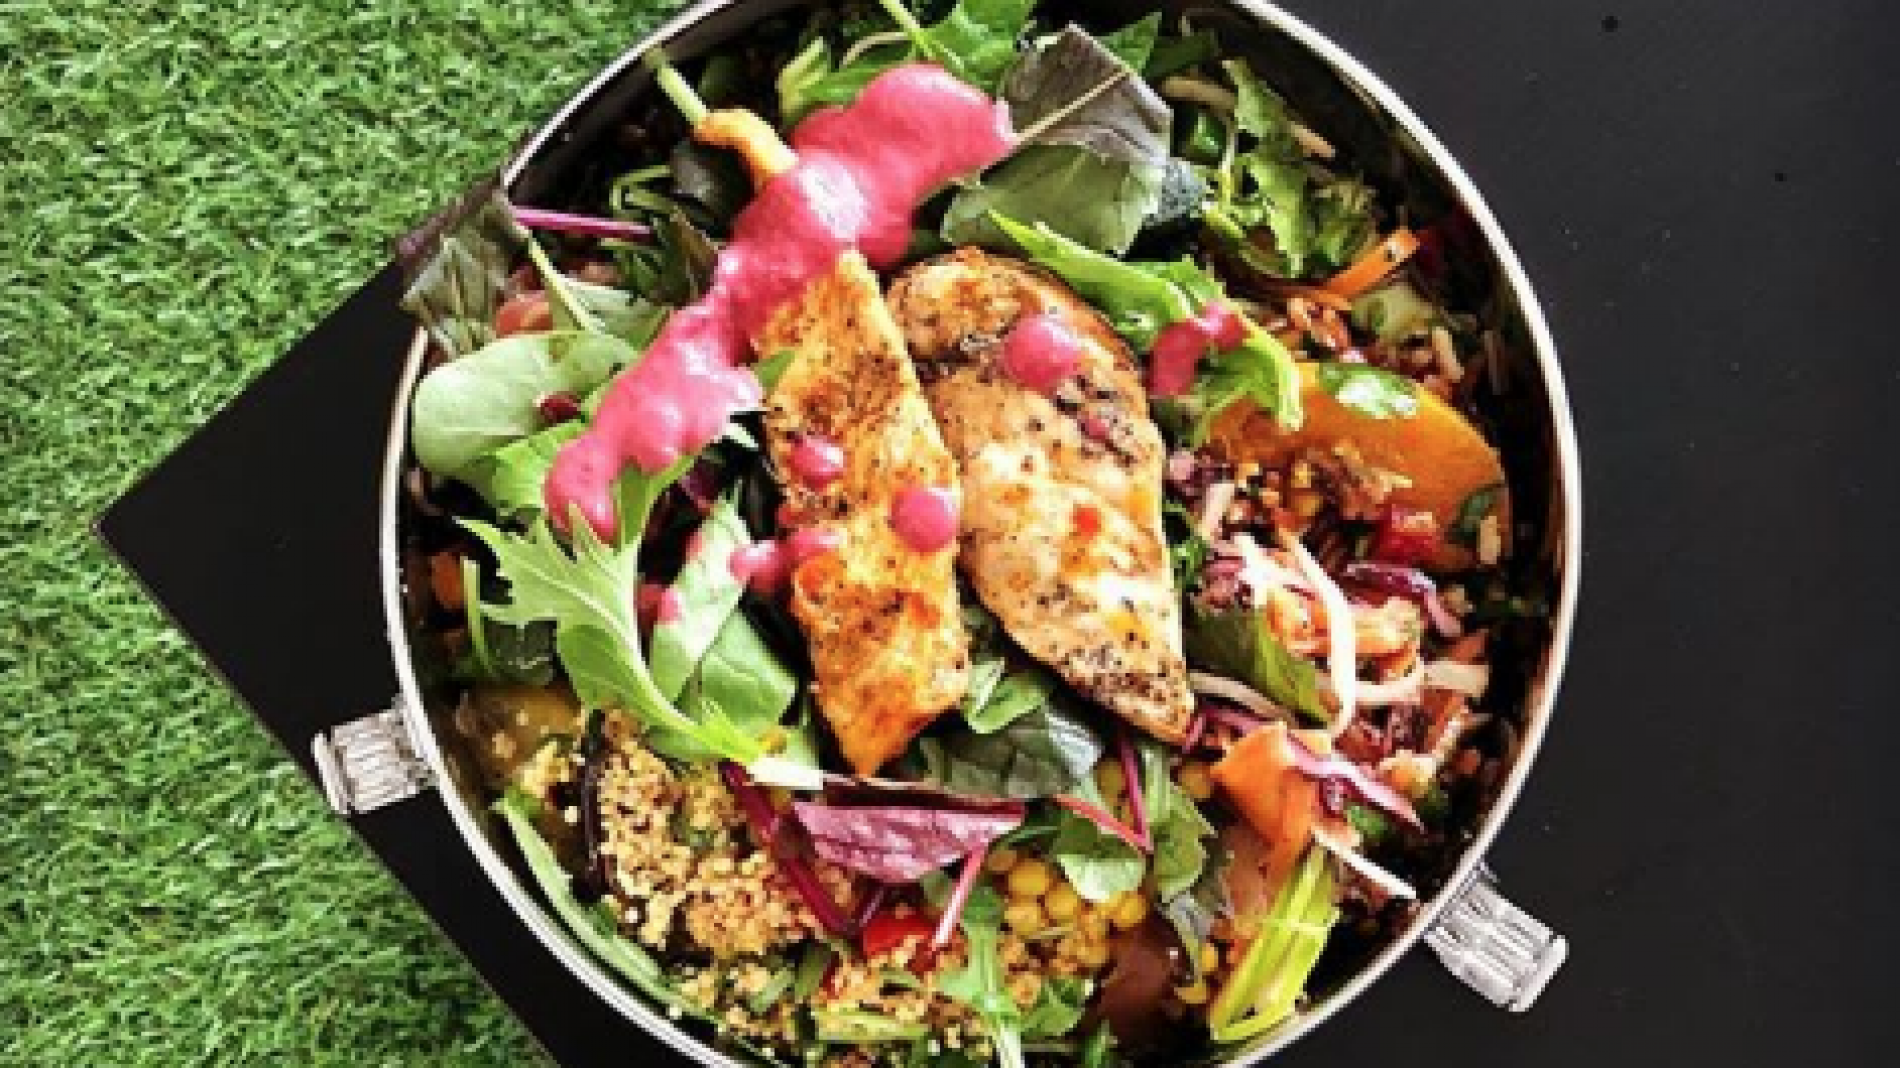 Stainless steel bowl full of salad